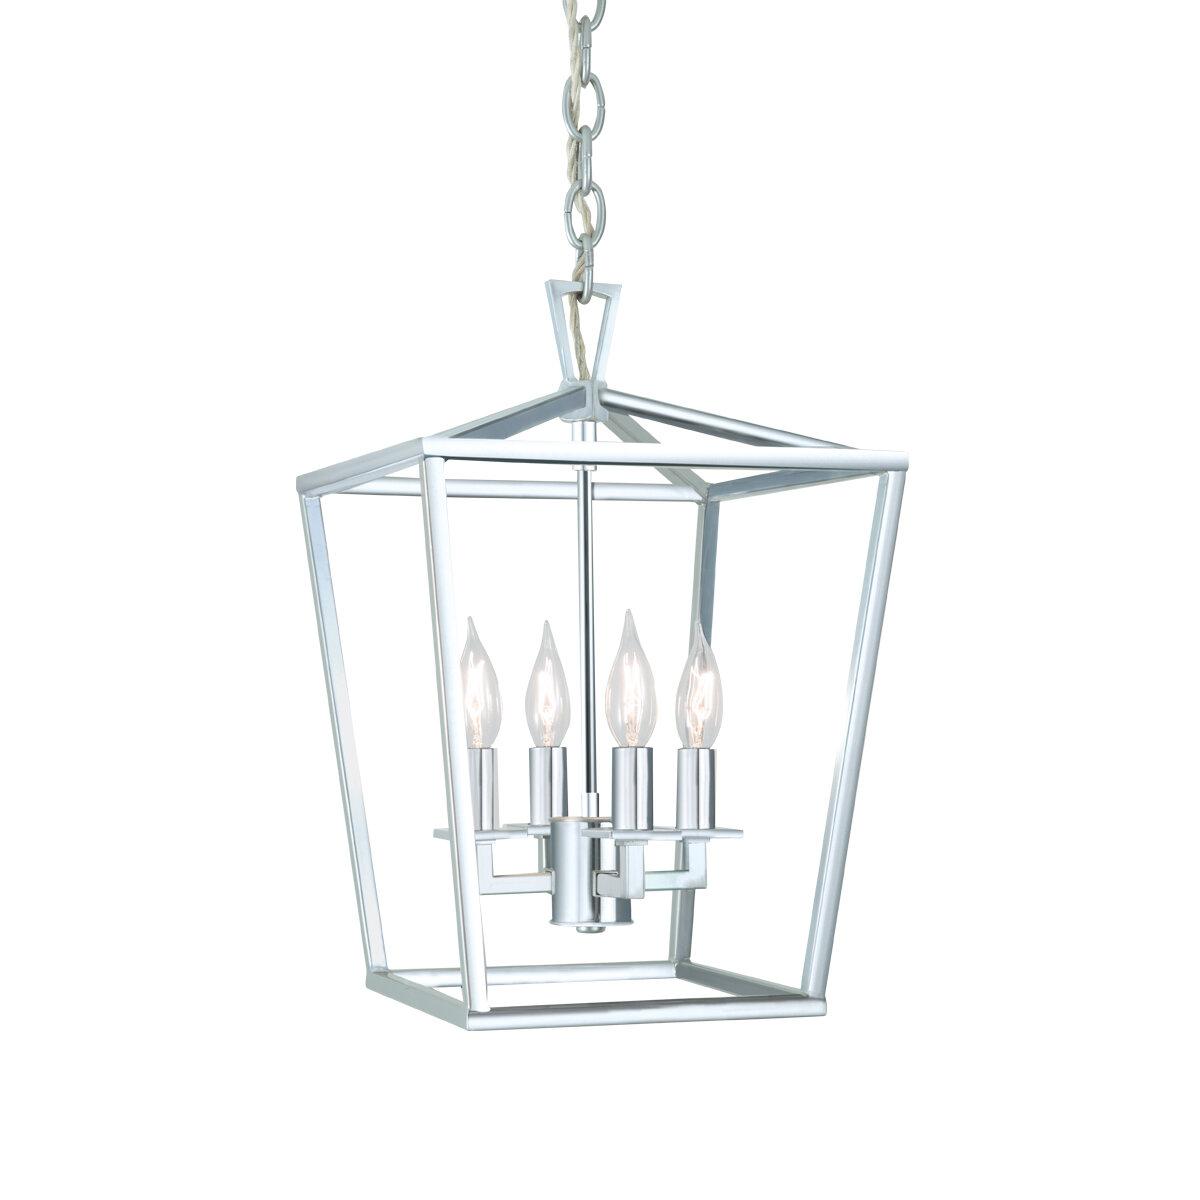 white foyer pendant lighting candle. White Foyer Pendant Lighting Candle O